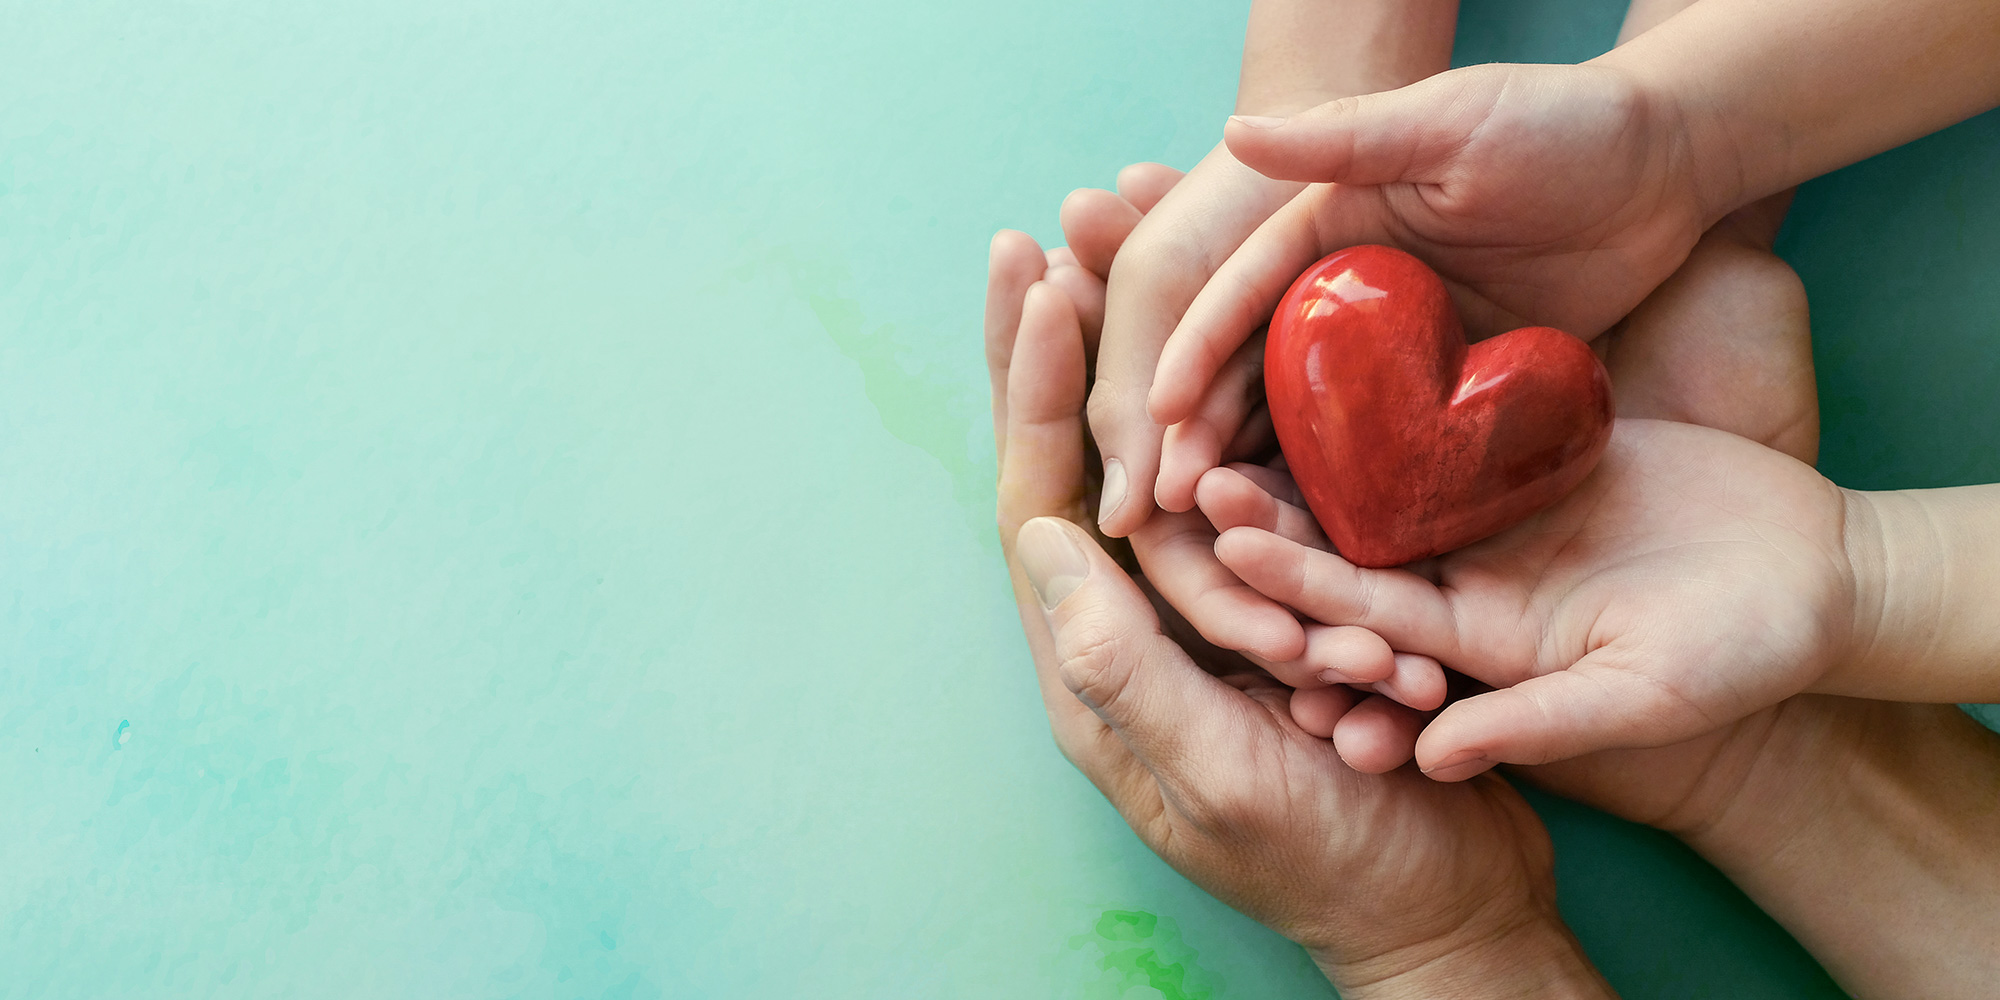 Donate to Postpartum Care Foundation